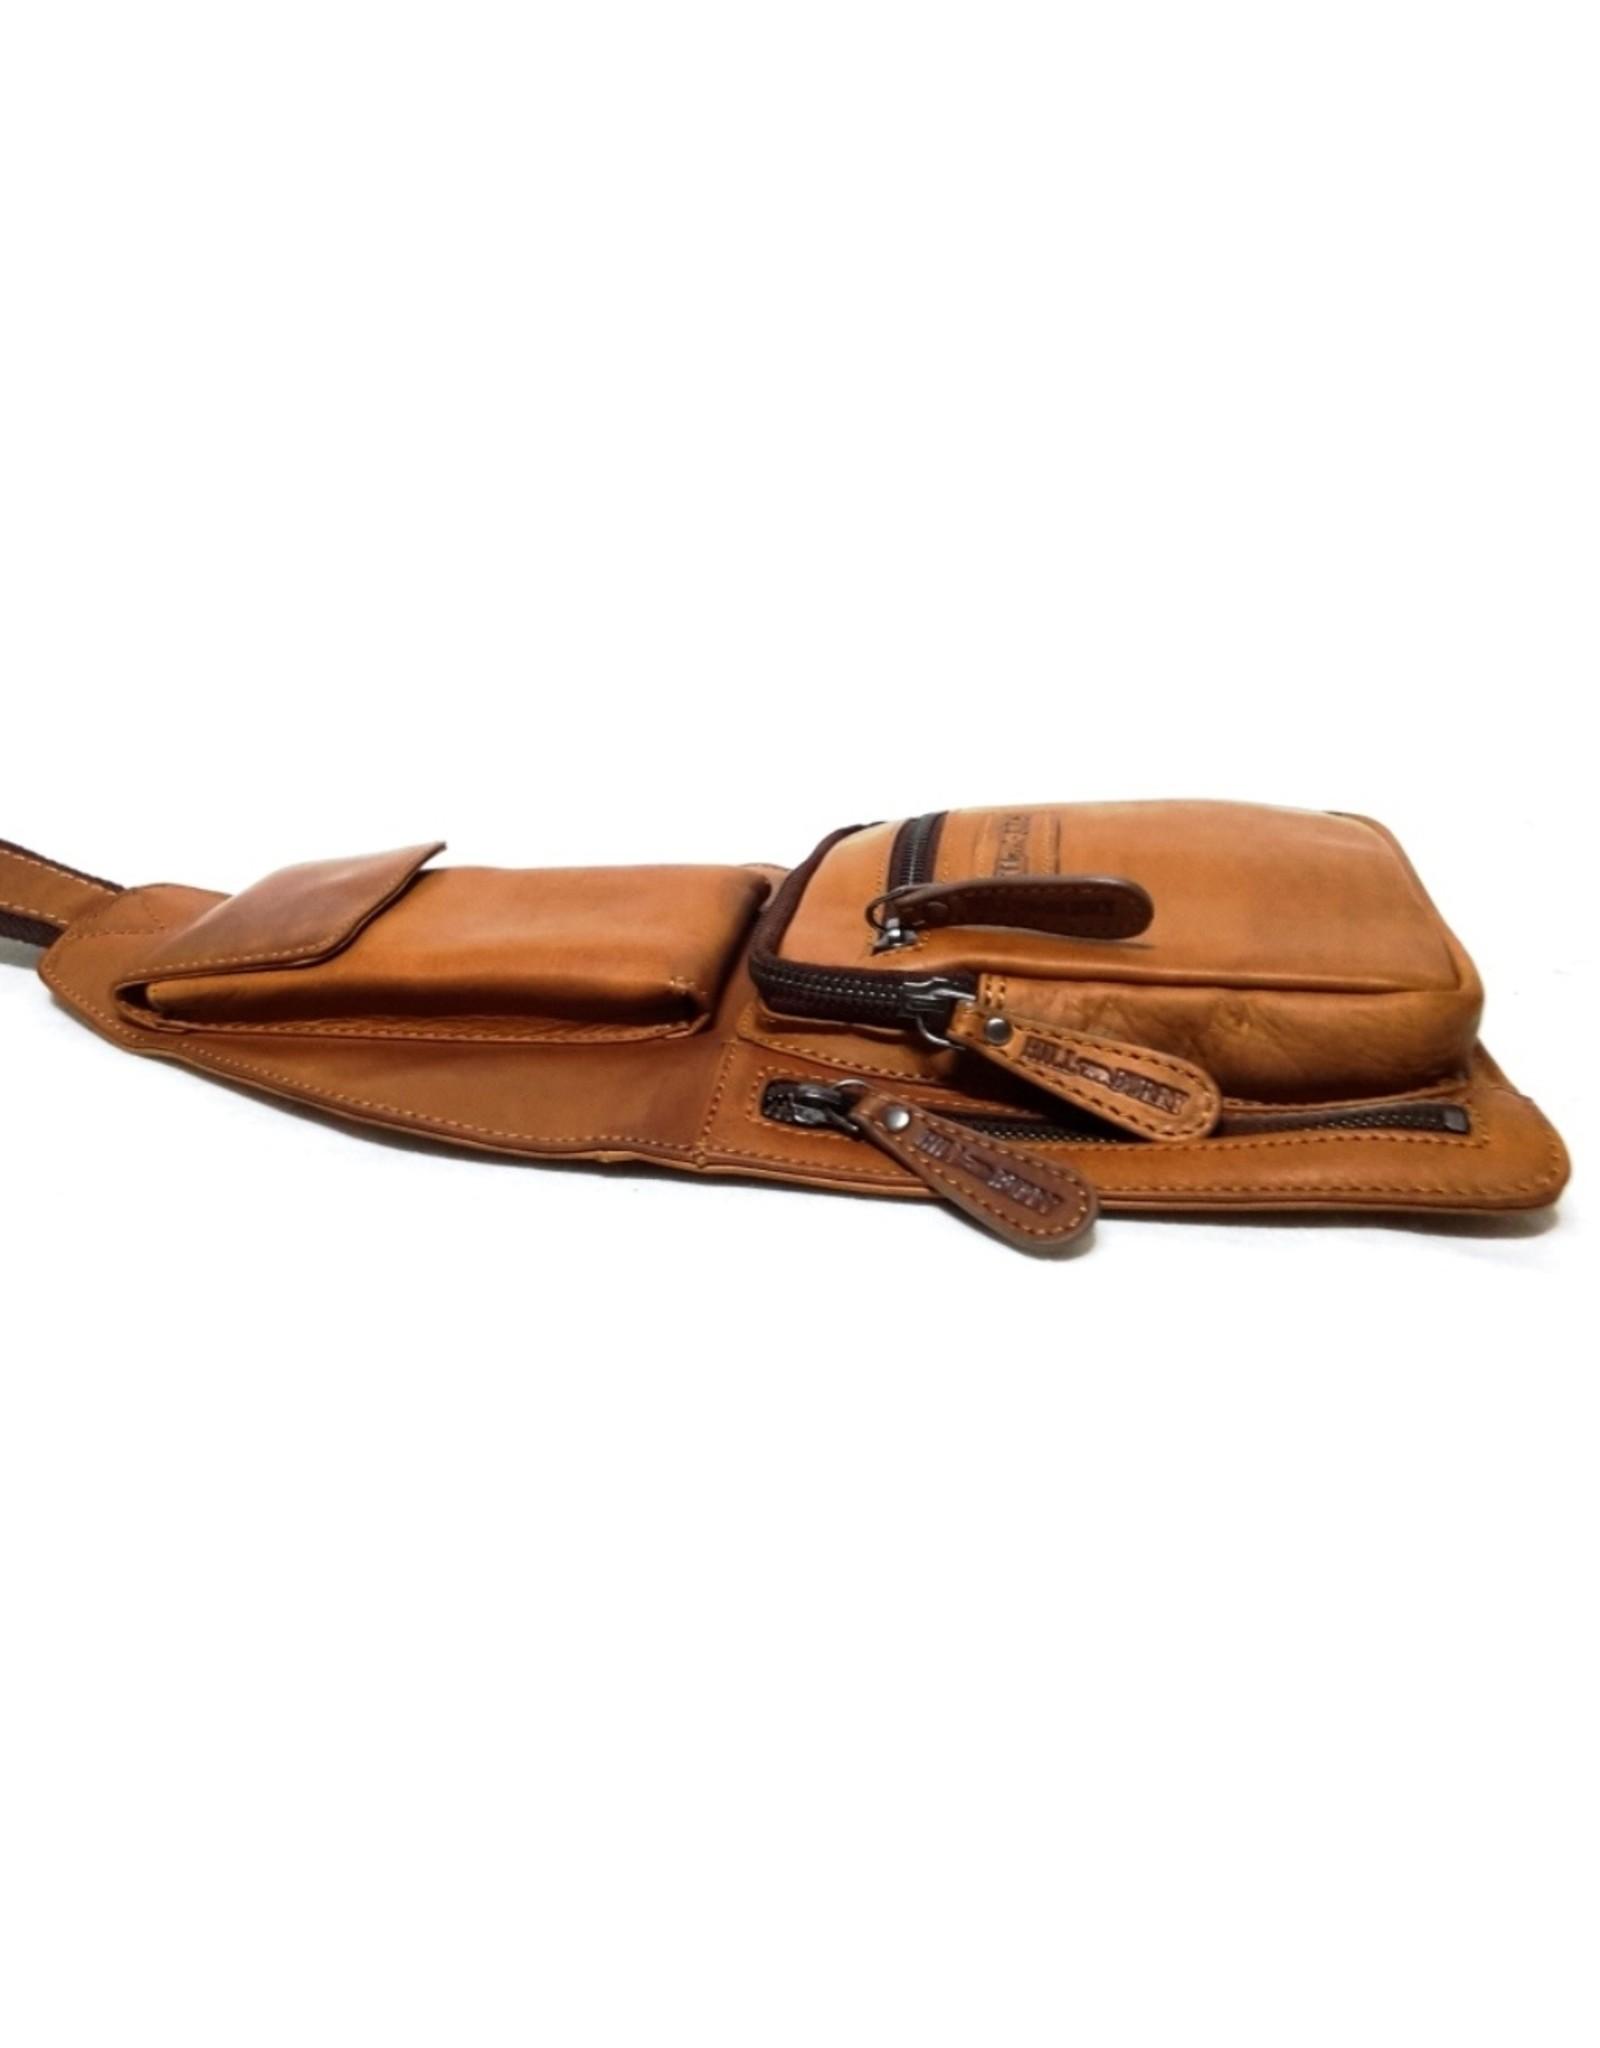 HillBurry Leather bags - Hillburry leather crossbody bag 3338